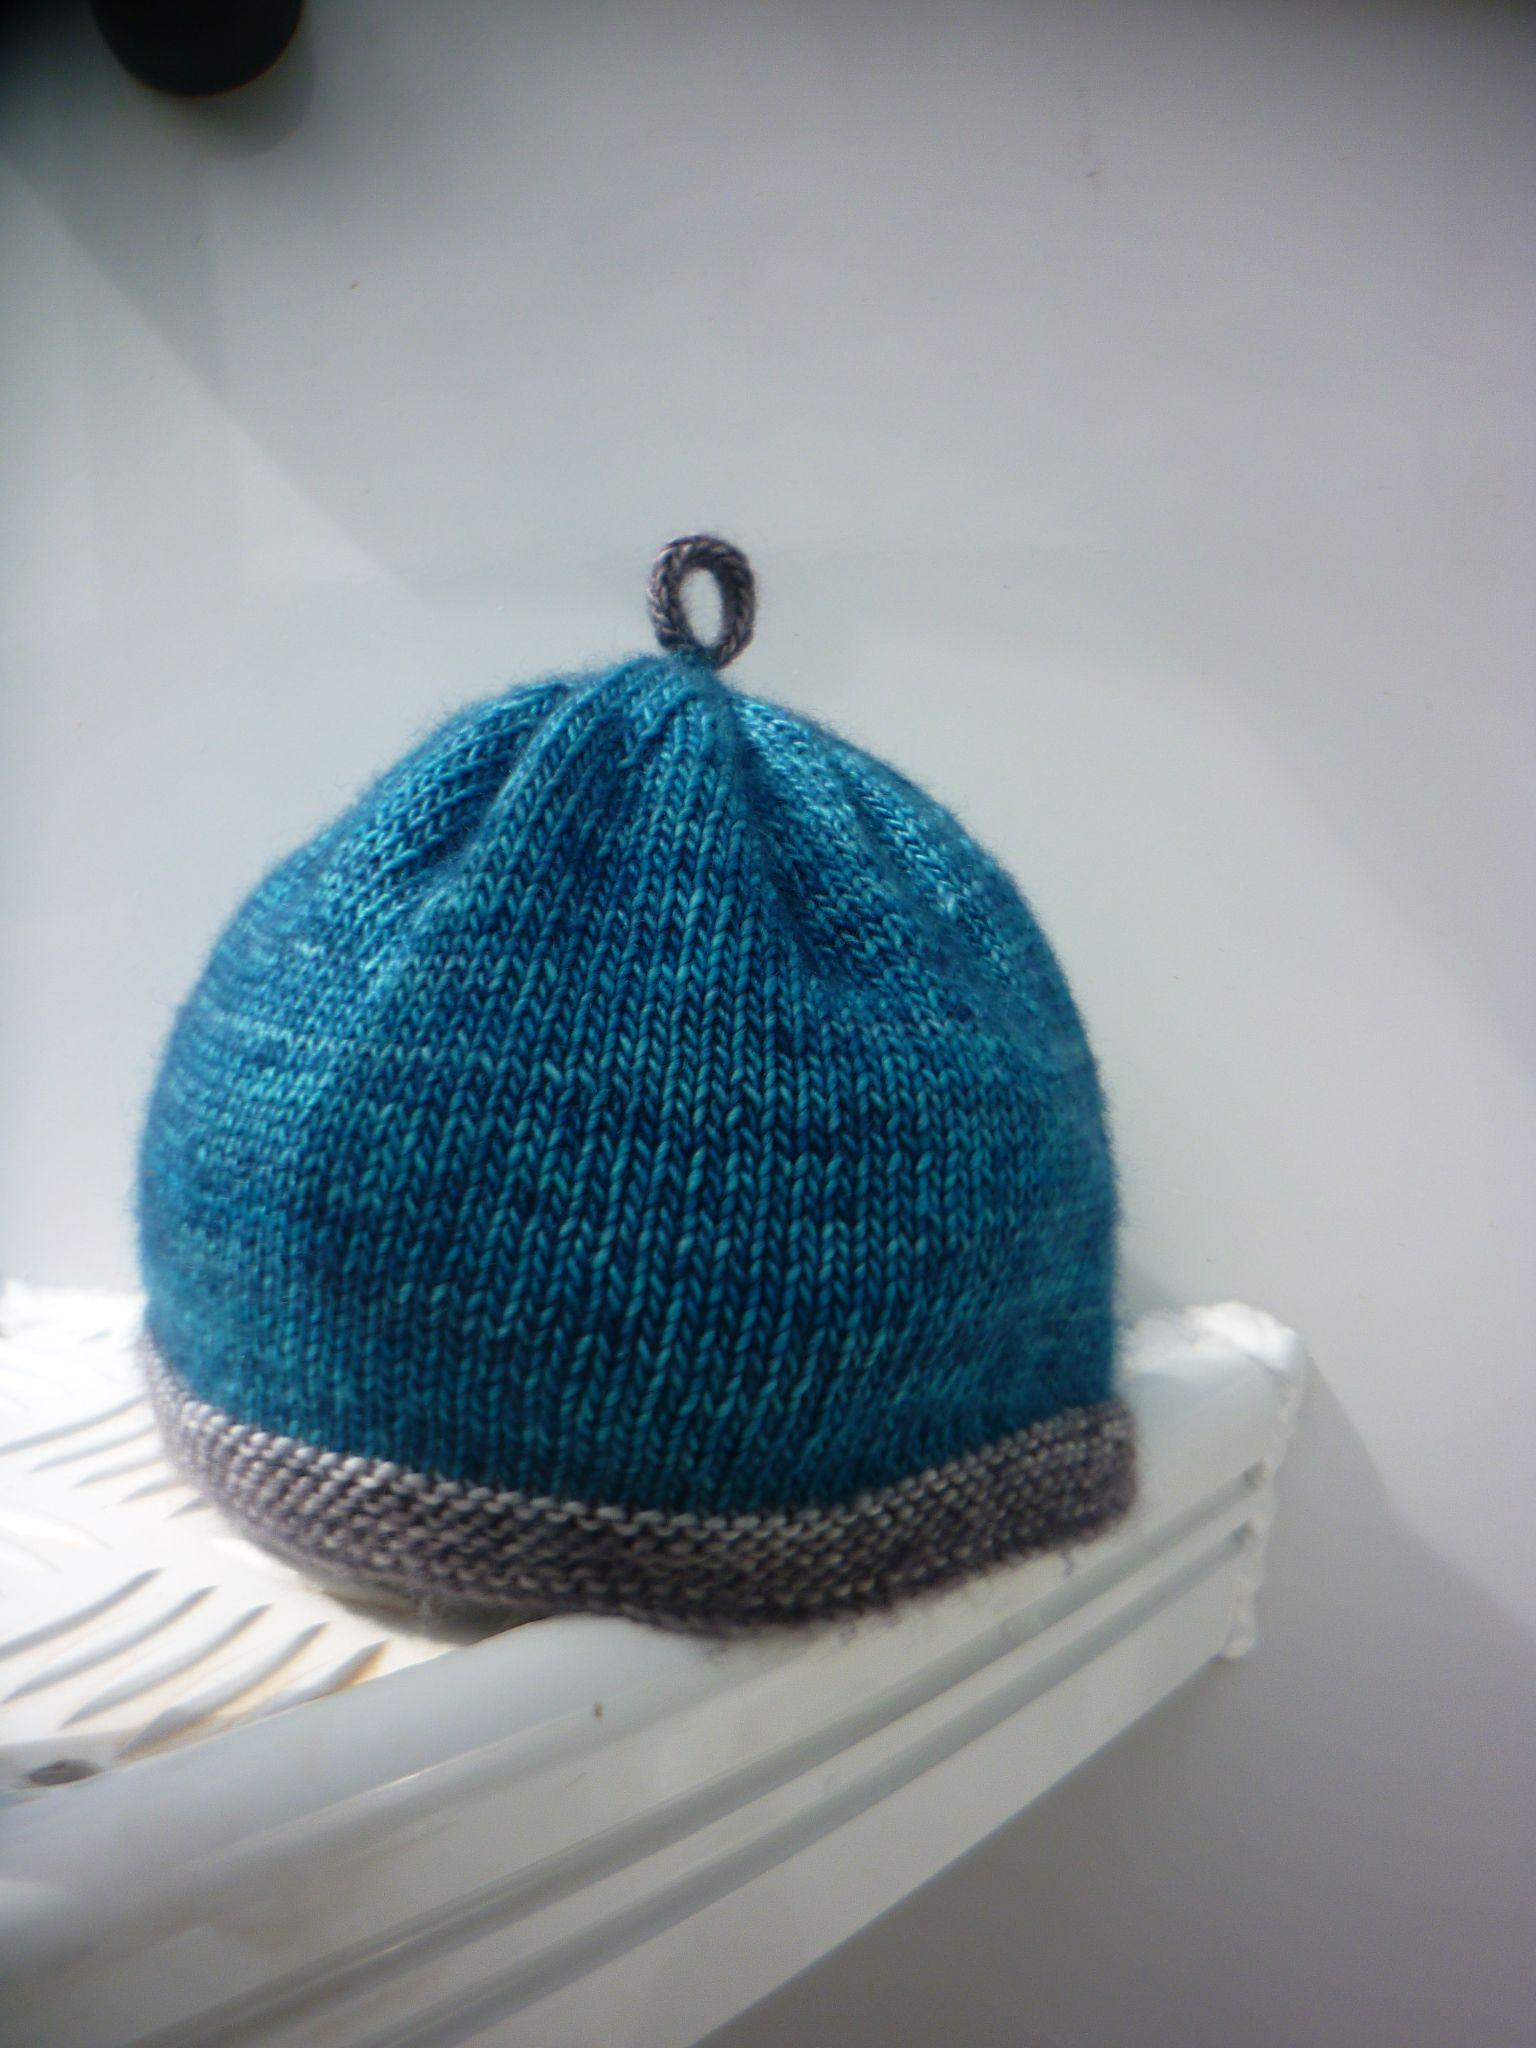 Heirloom baby hat free pattern // heathercairns on Ravelry | knit ...